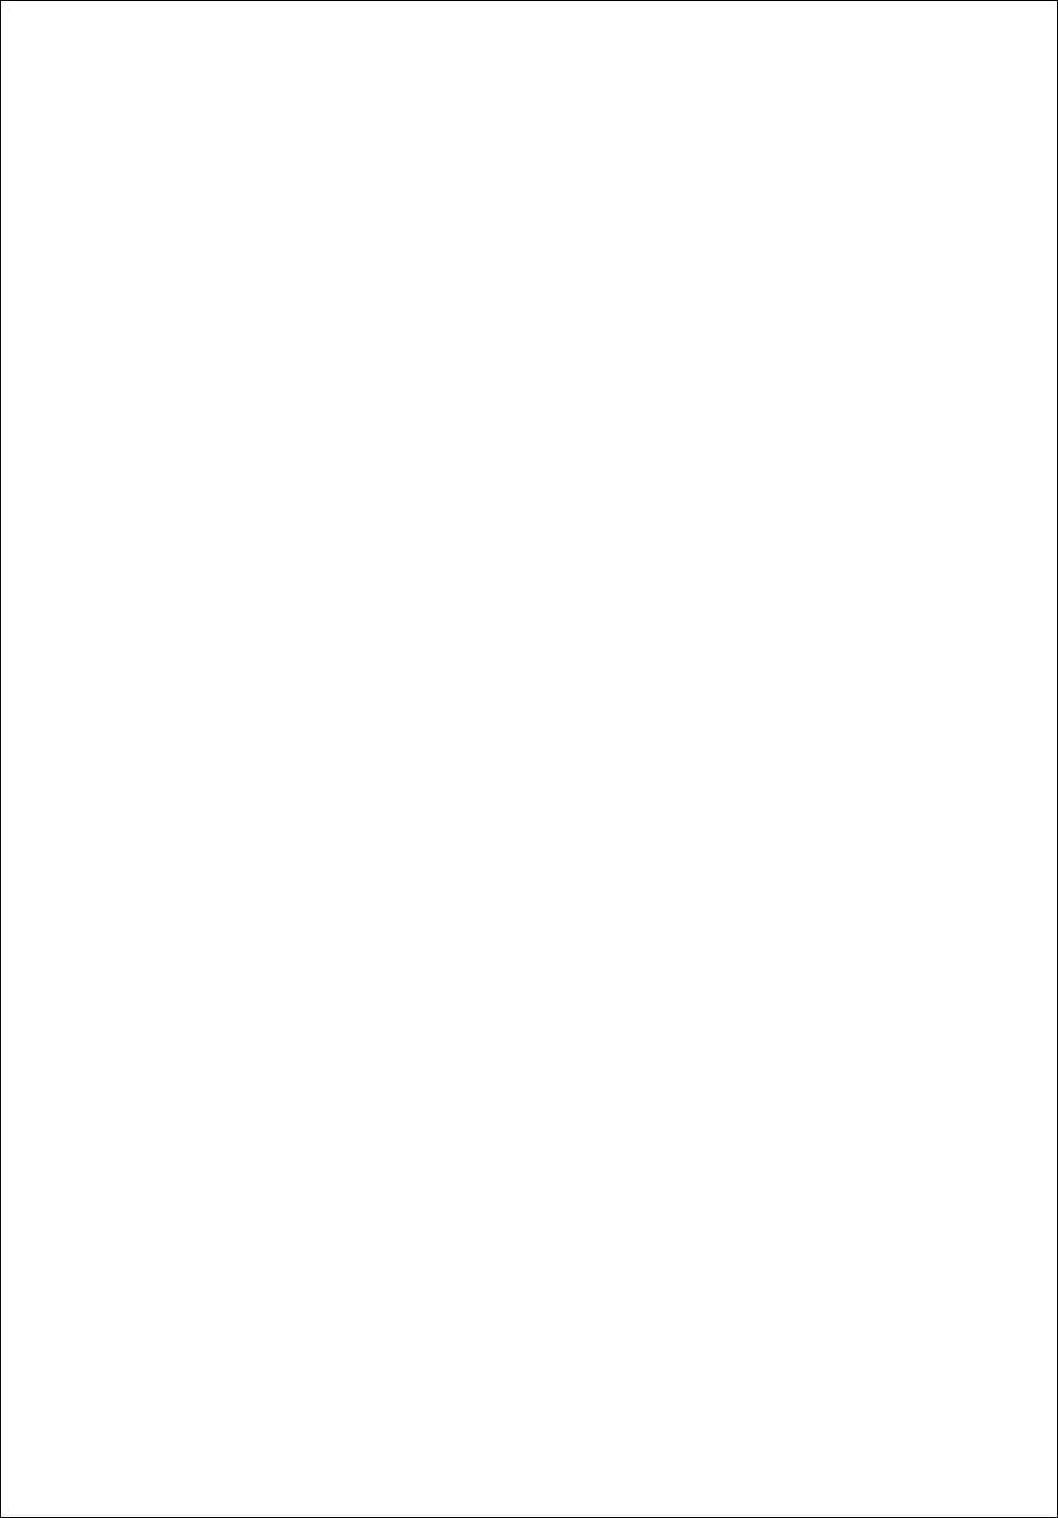 Hajimete no Sailor Fuku | Hajime's First Sailor Suit 50